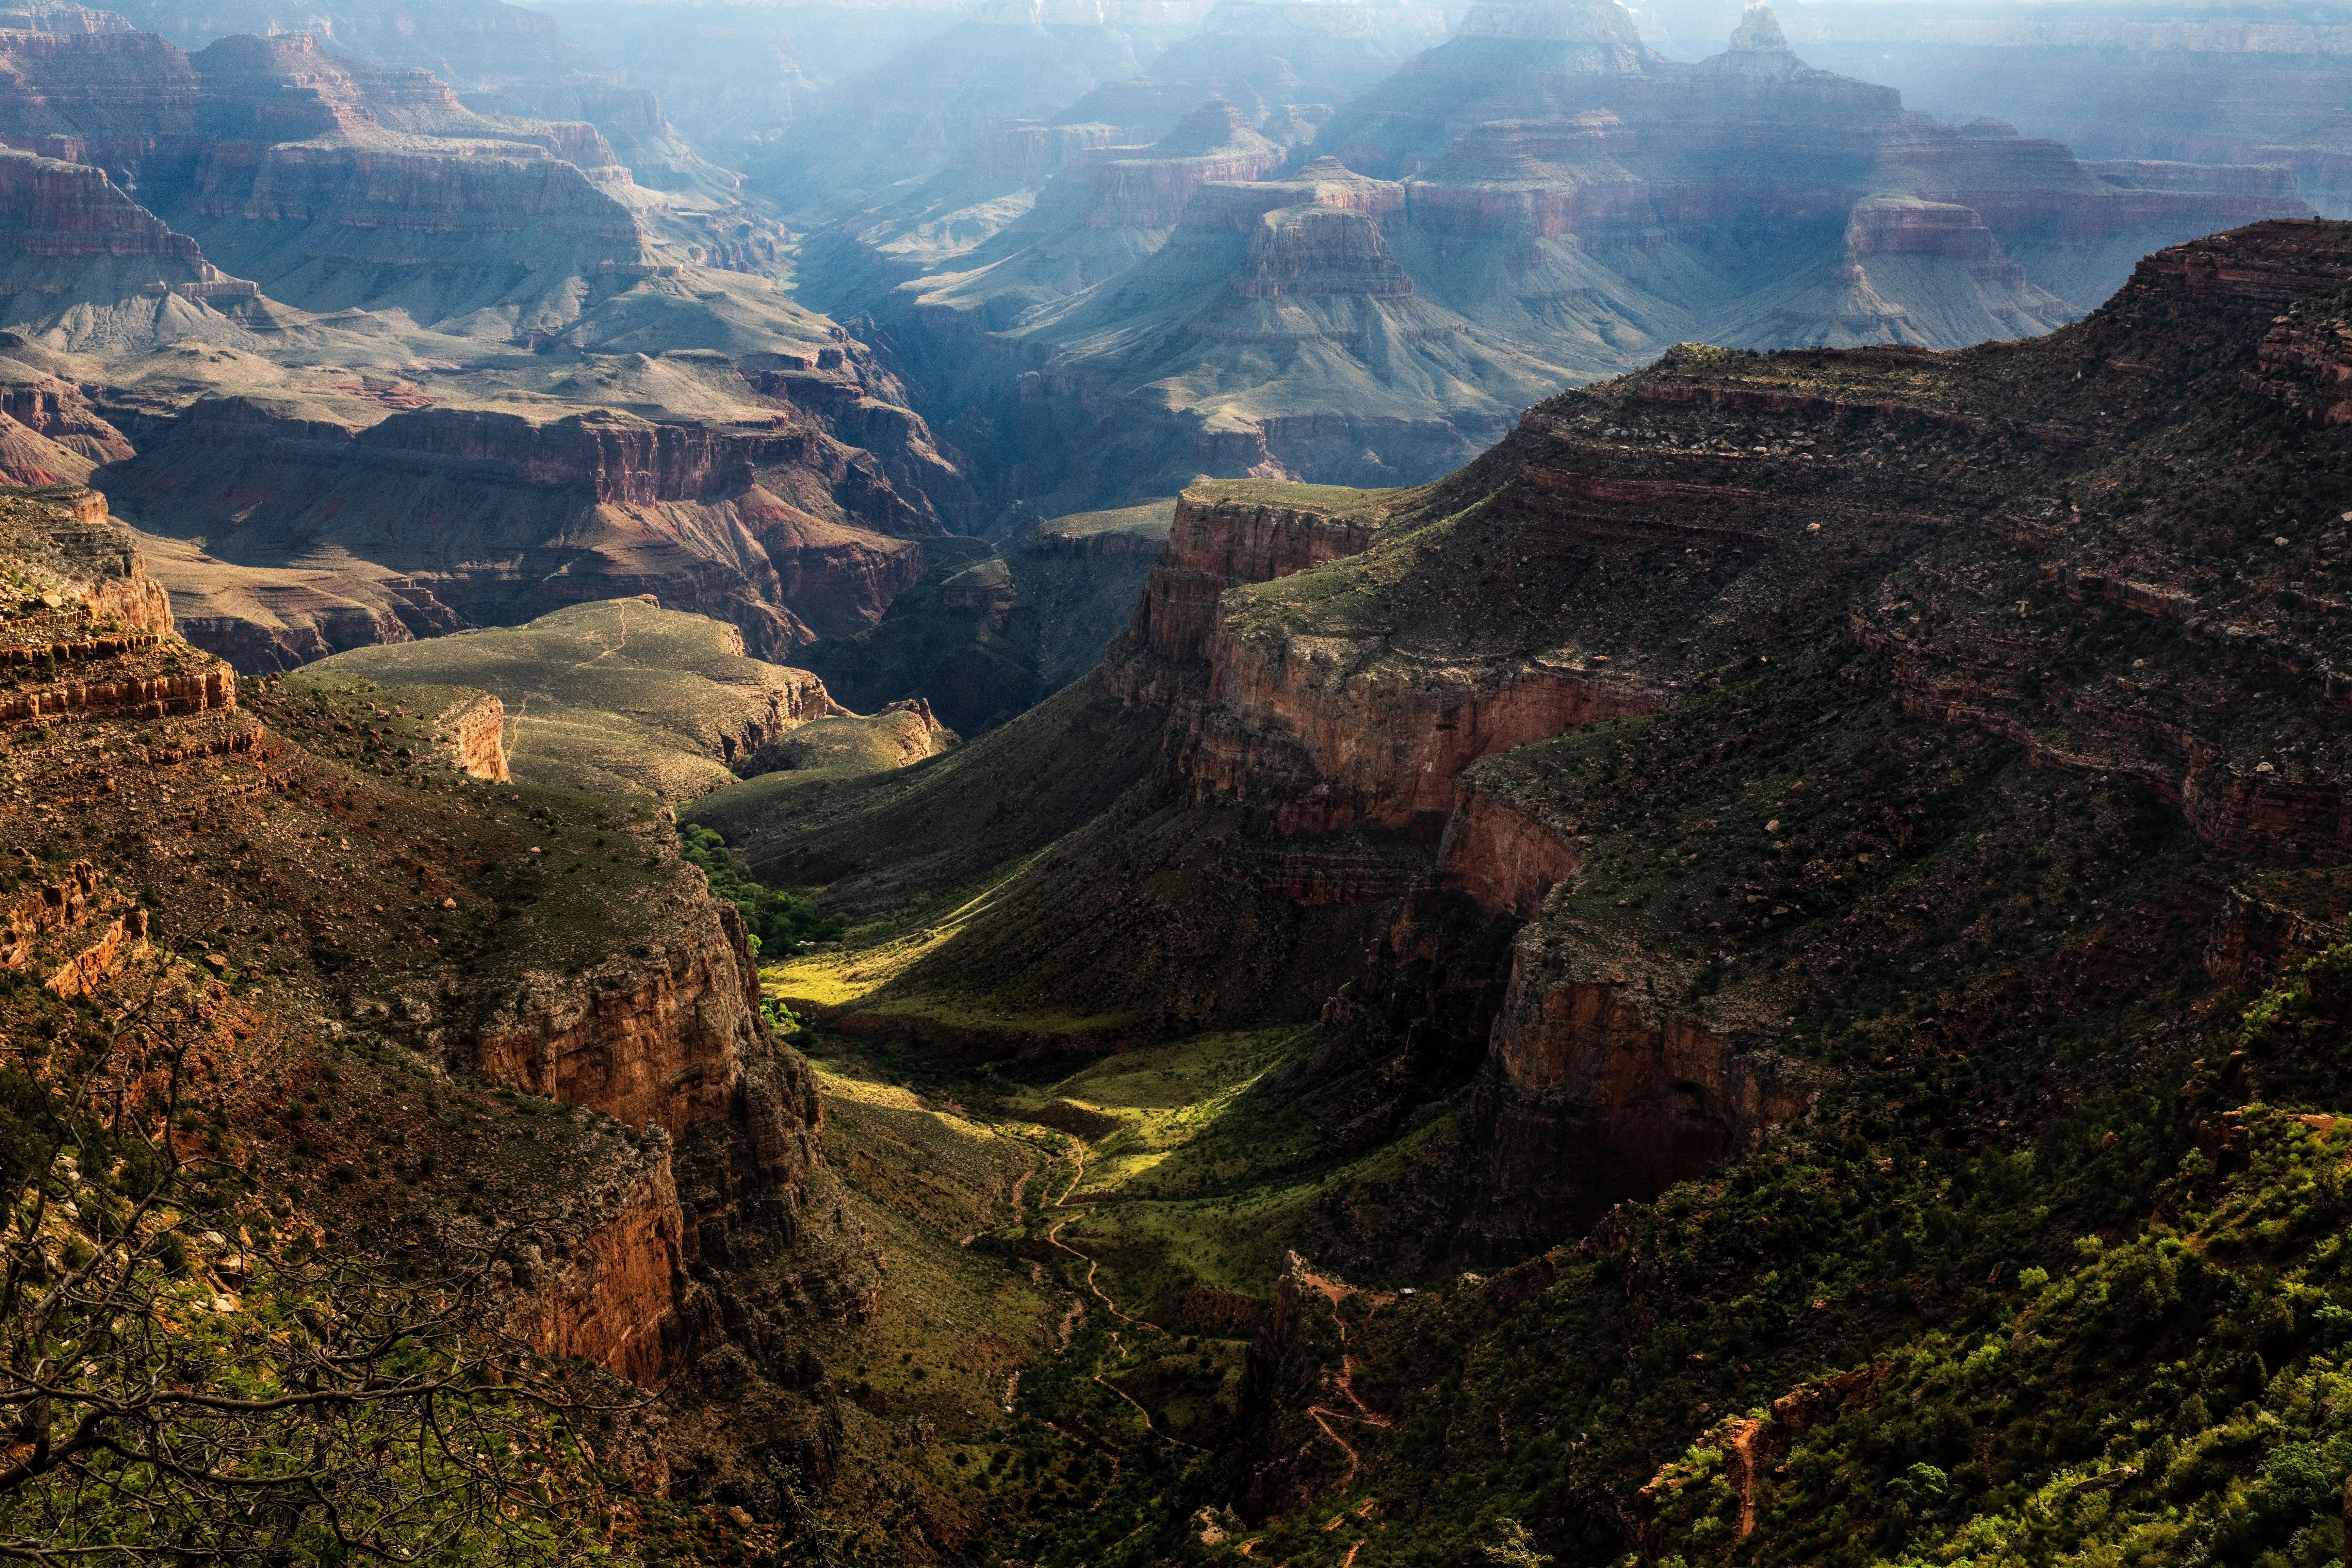 Canyon Mountain Nature Usa 7200x4800